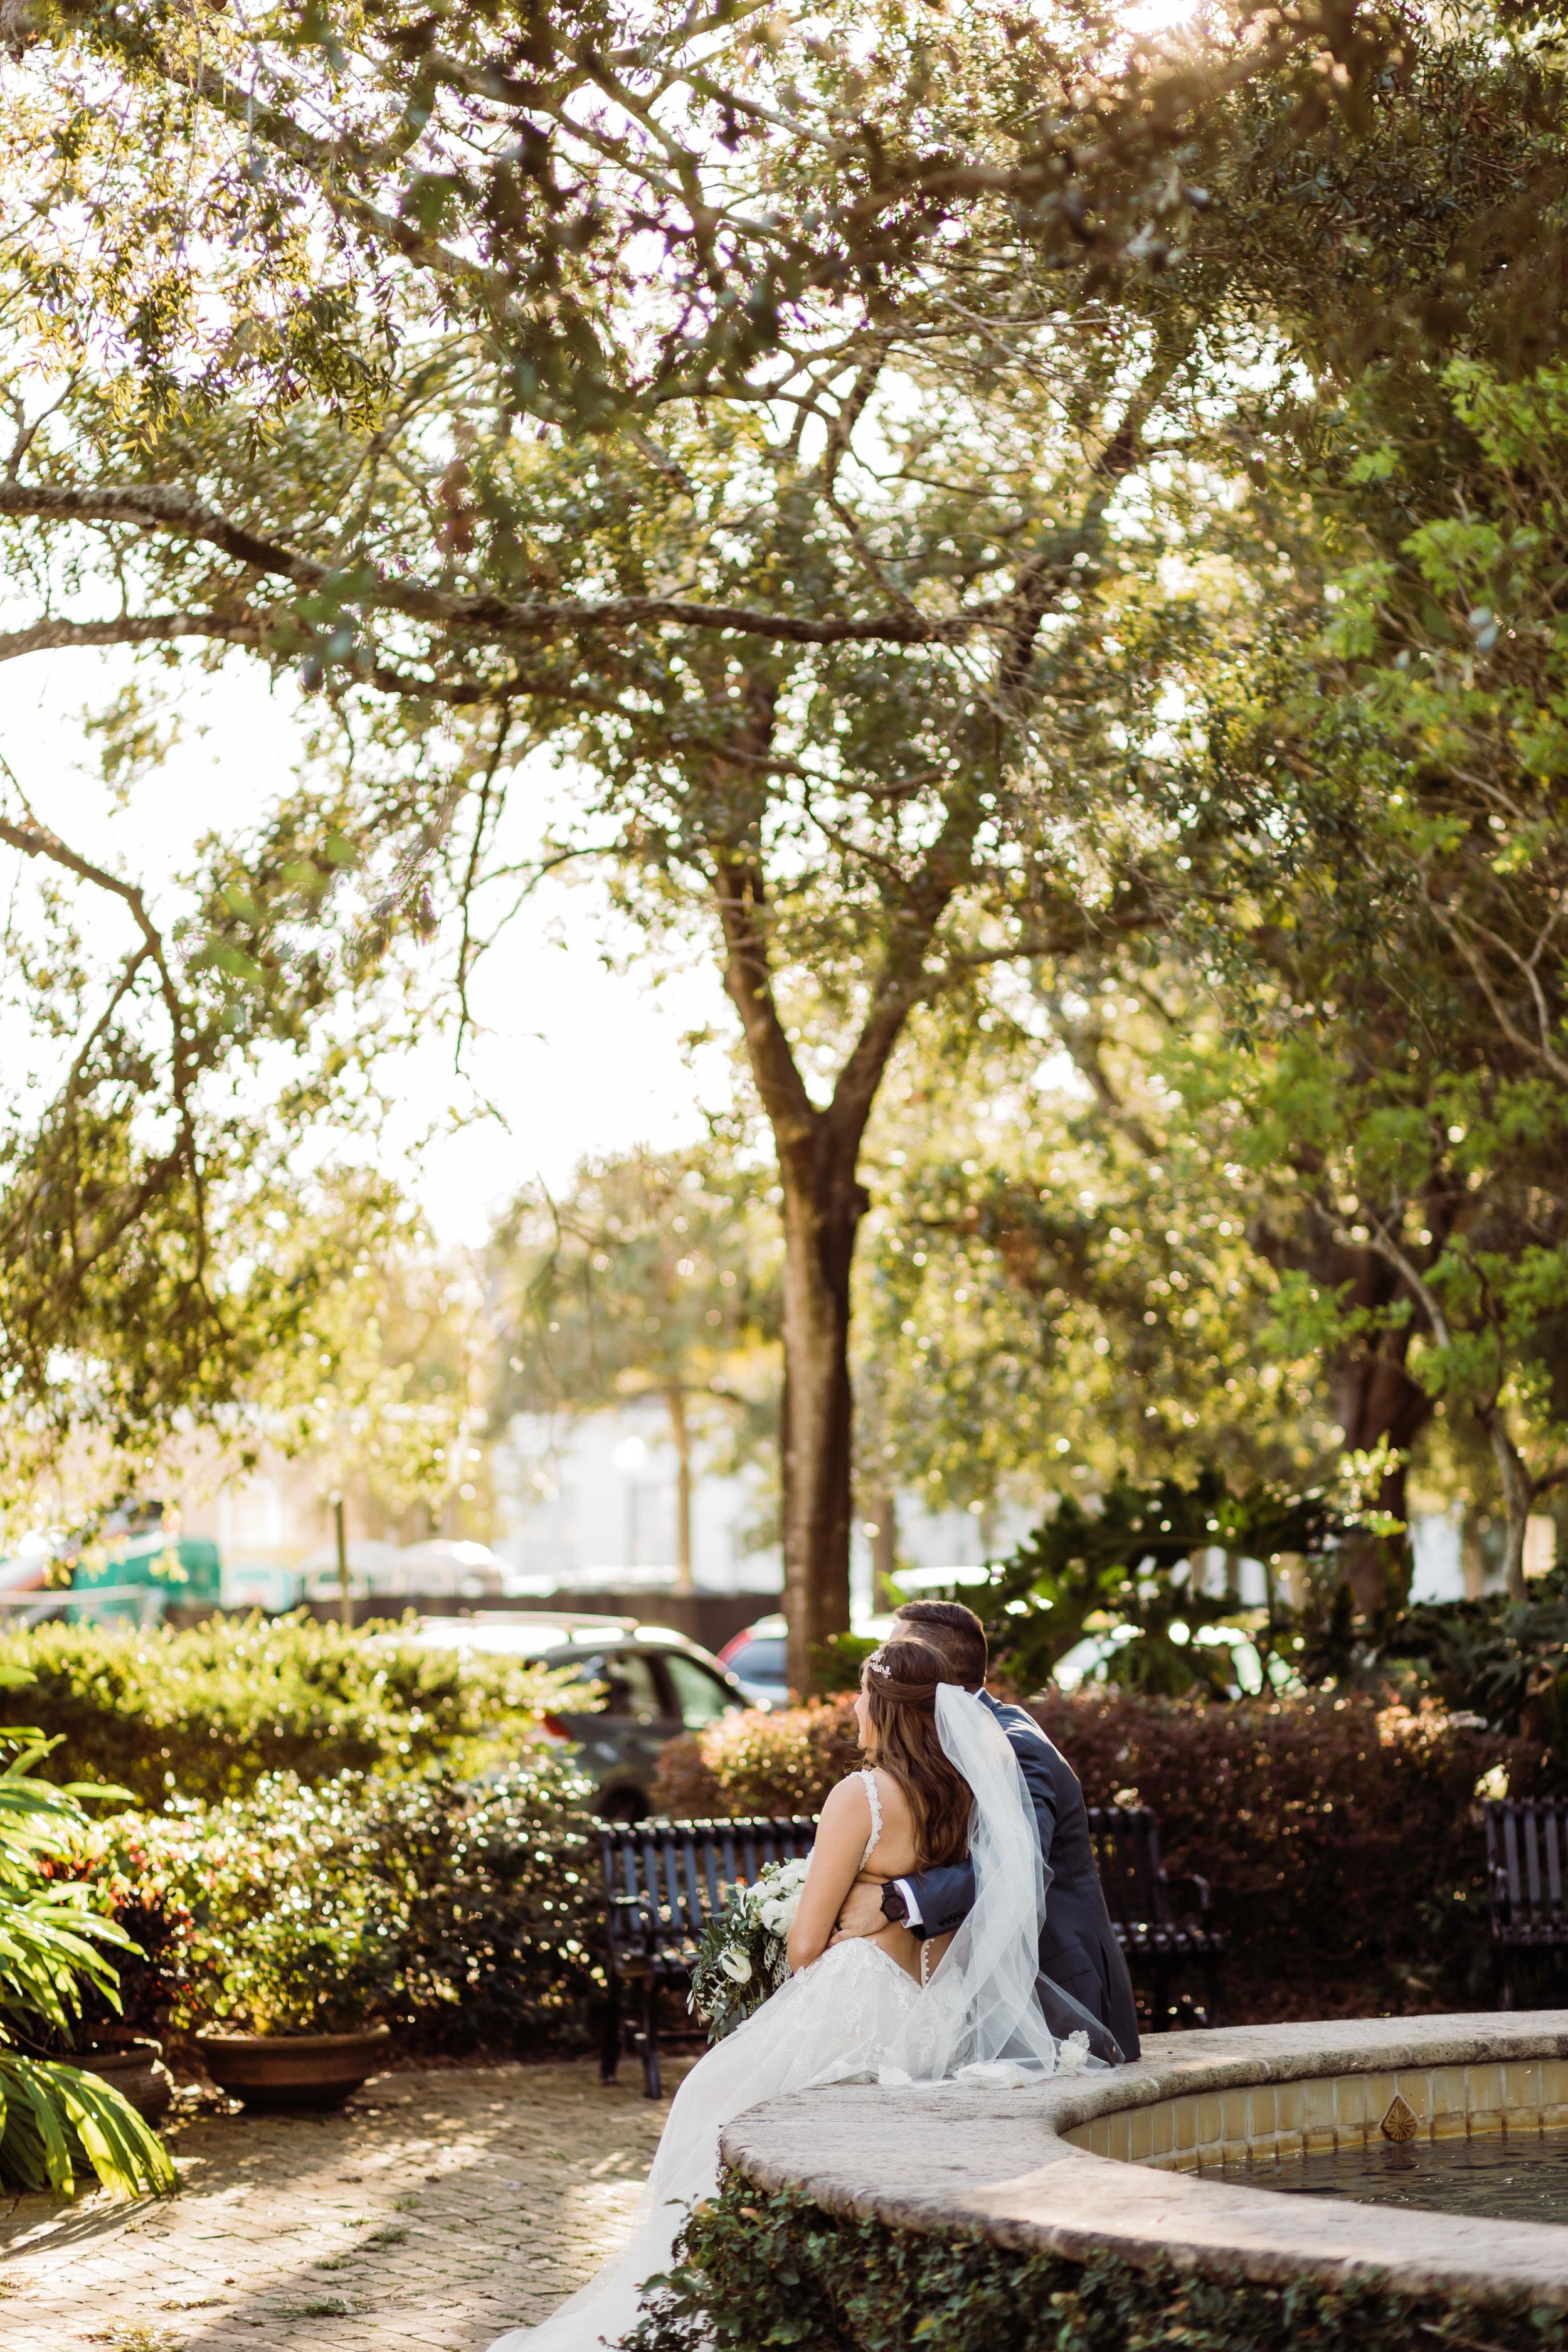 2017.10.15 Steffi and Elliott Simmonds Casa Feliz Wedding (536 of 969).jpg